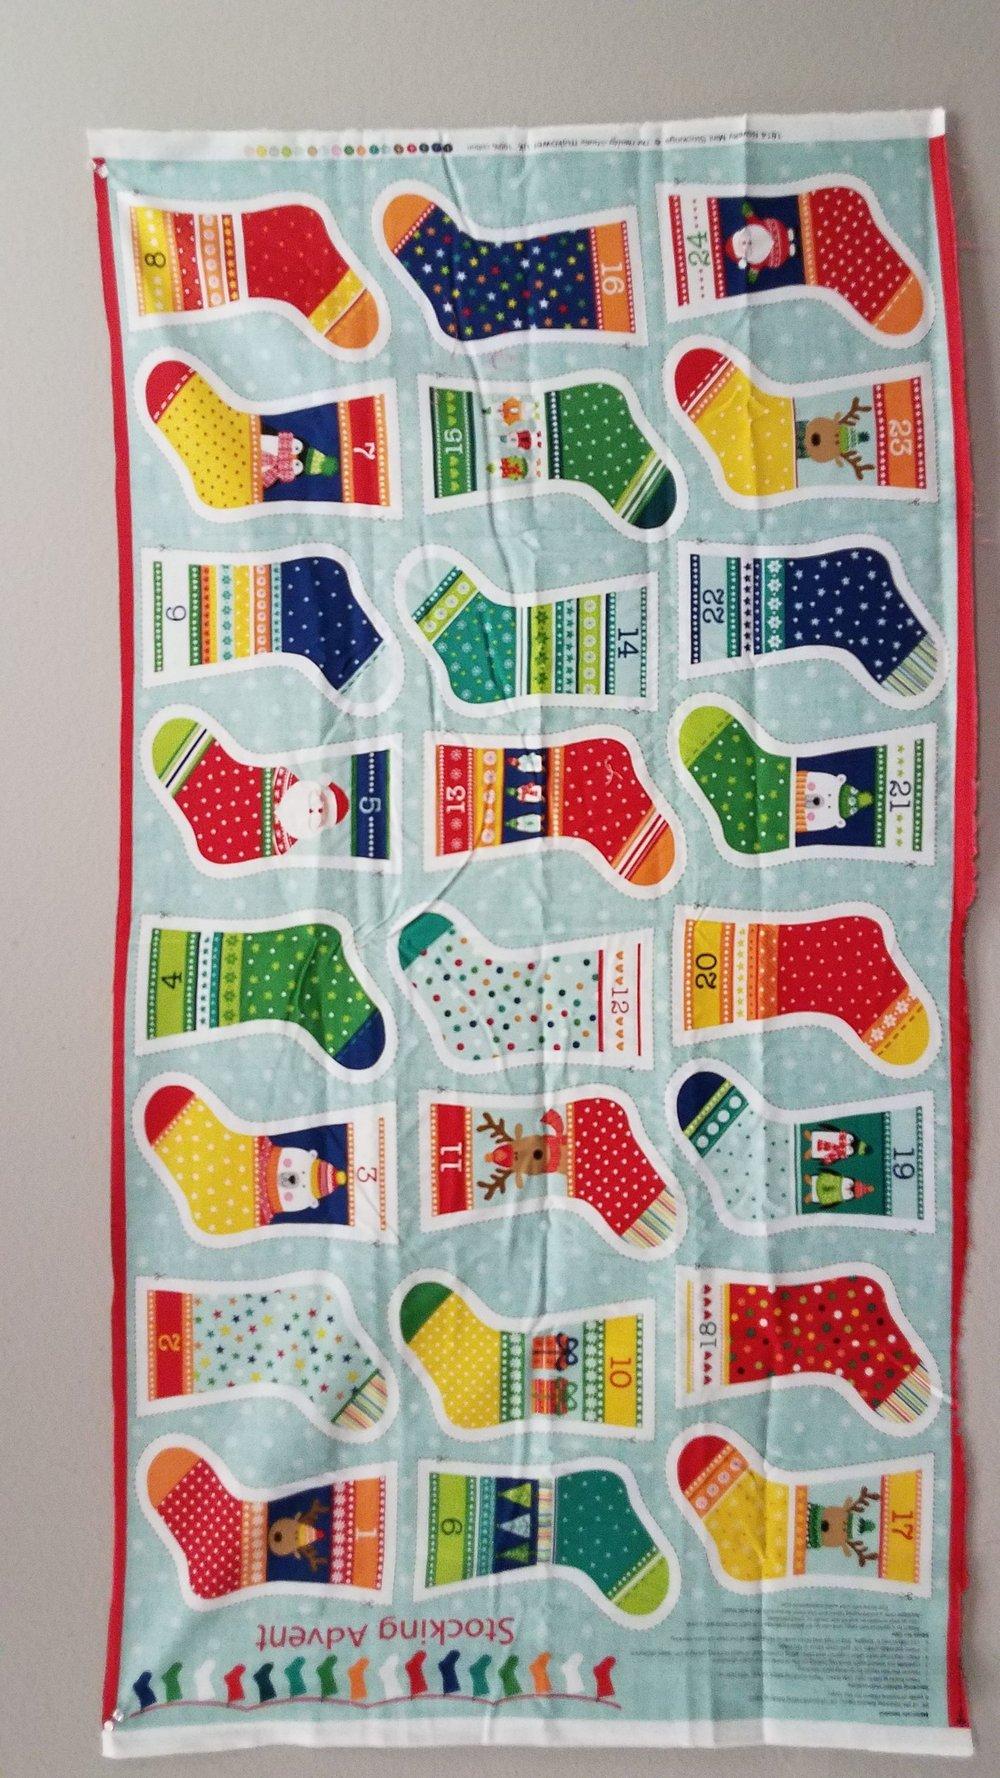 Stocking Advent - Mini Stocking Calendar - Panel by the Henley Studio for Makower UK